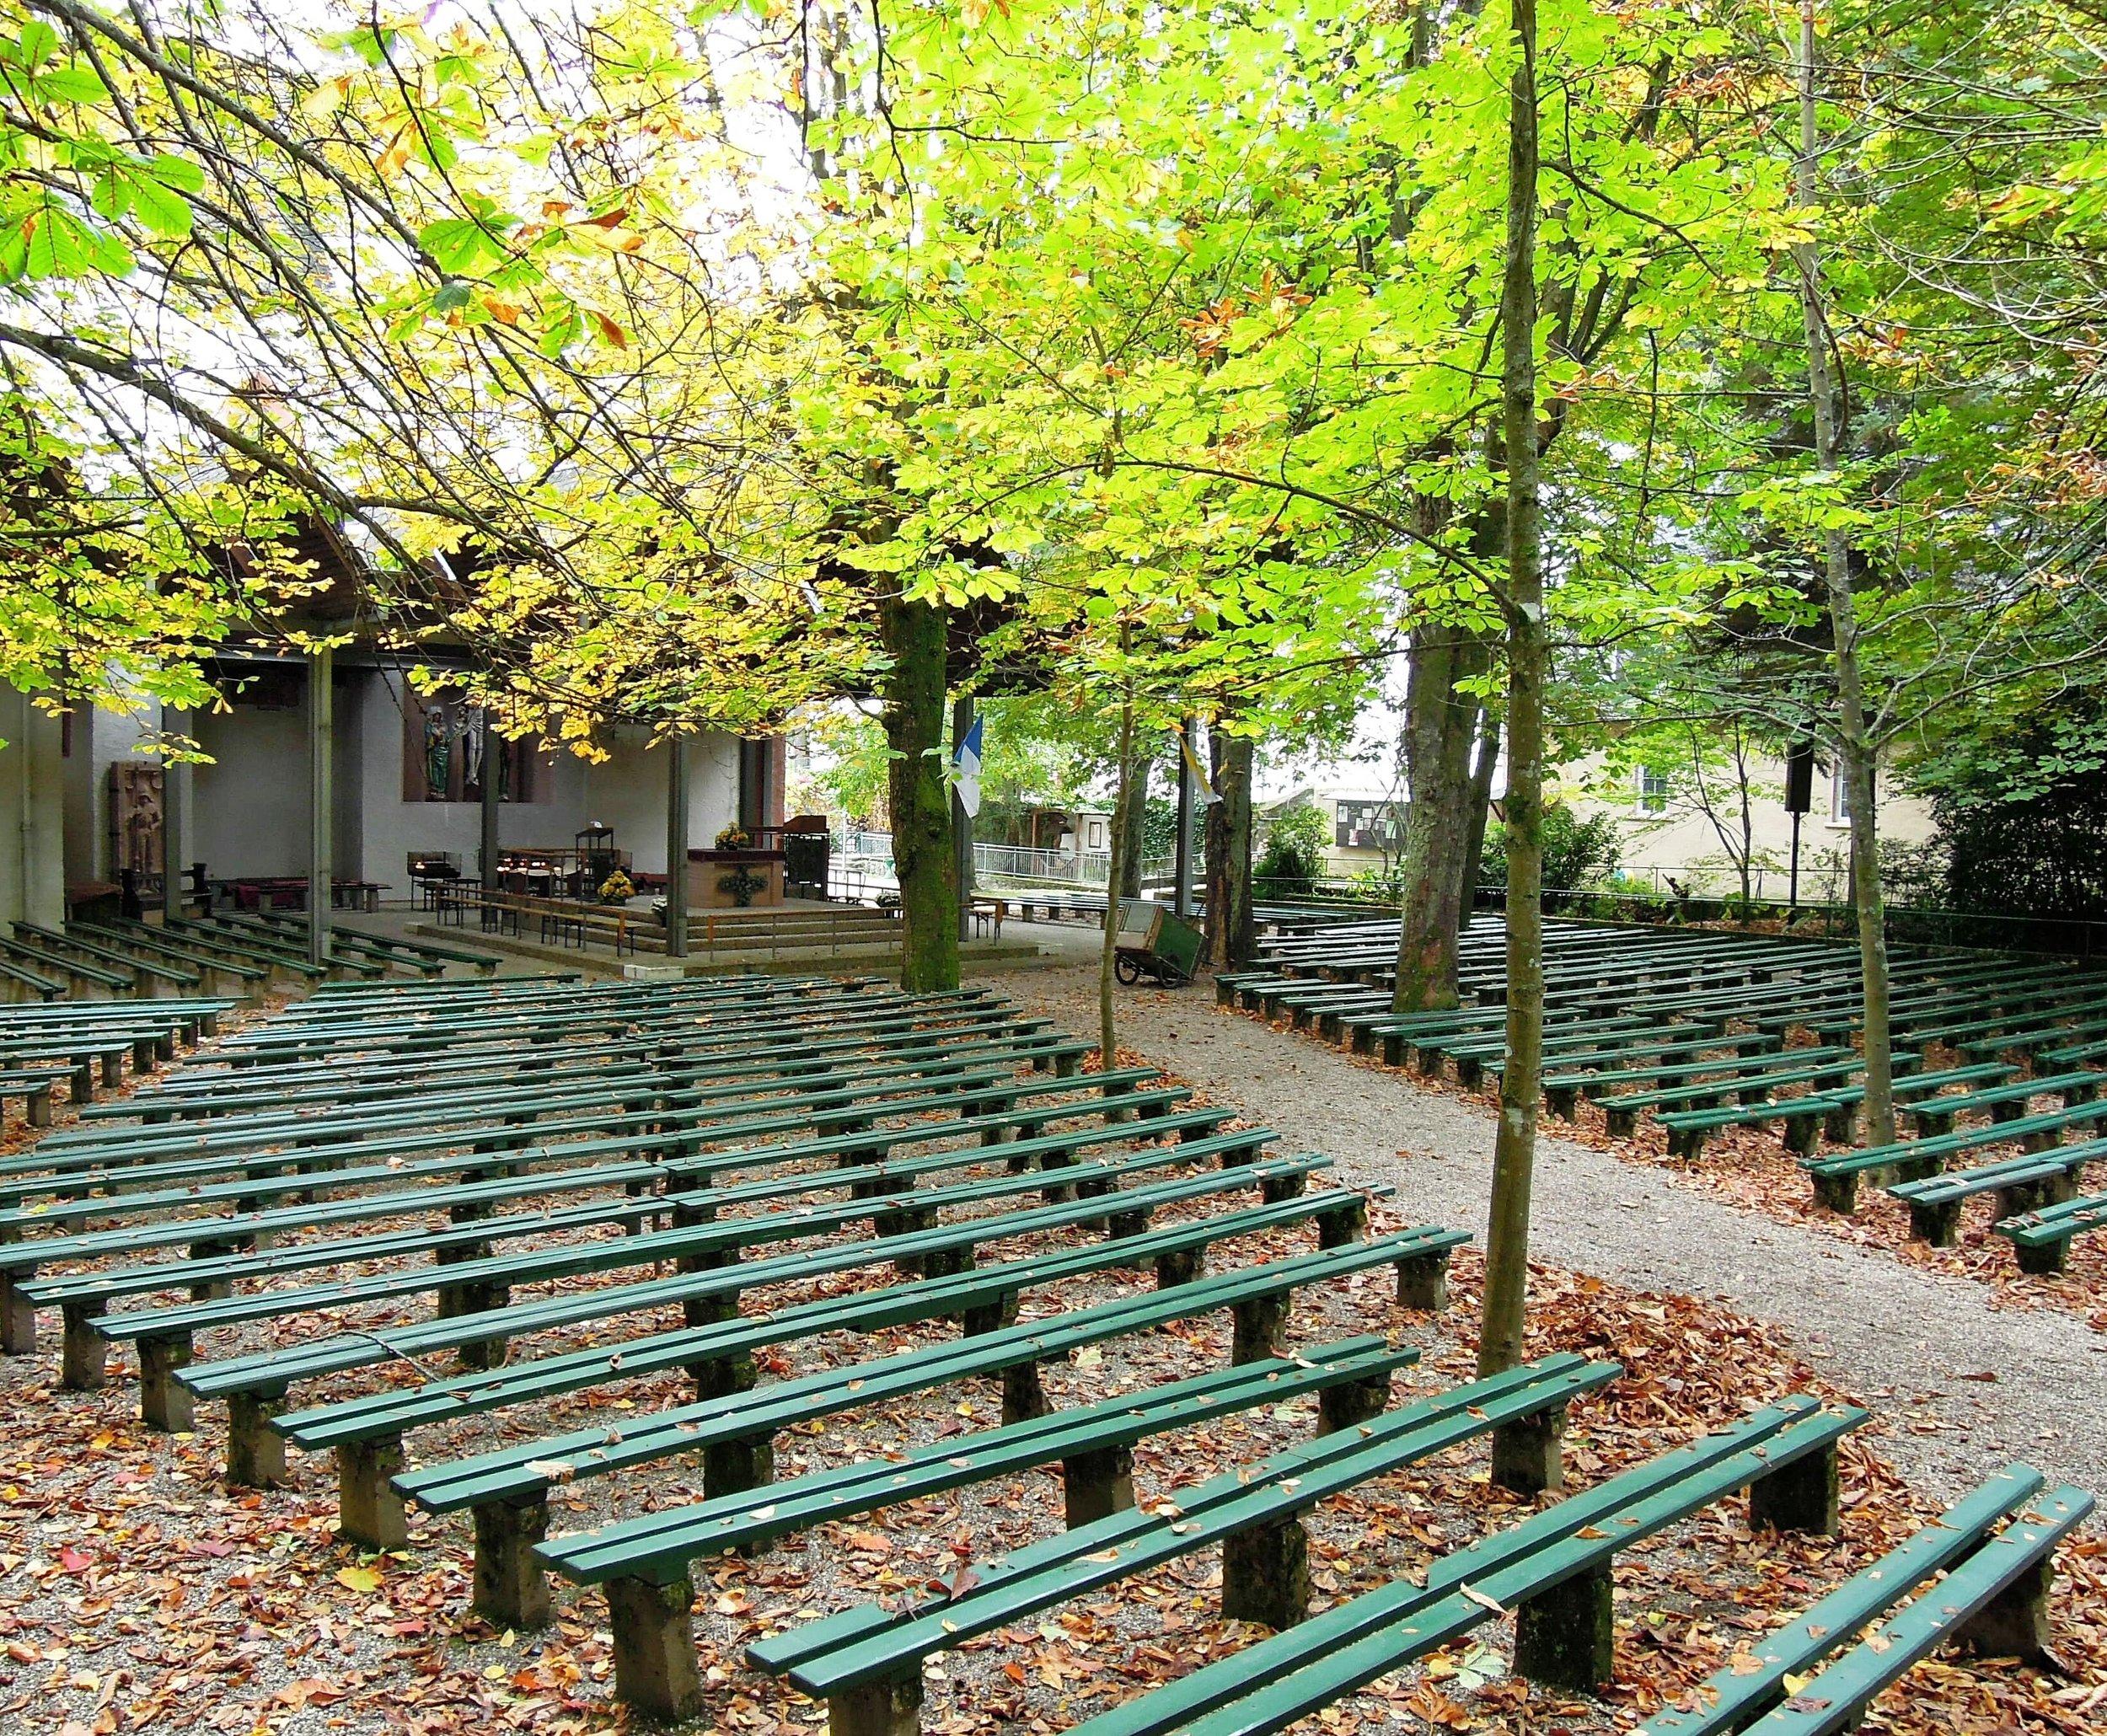 benches-192707.jpg